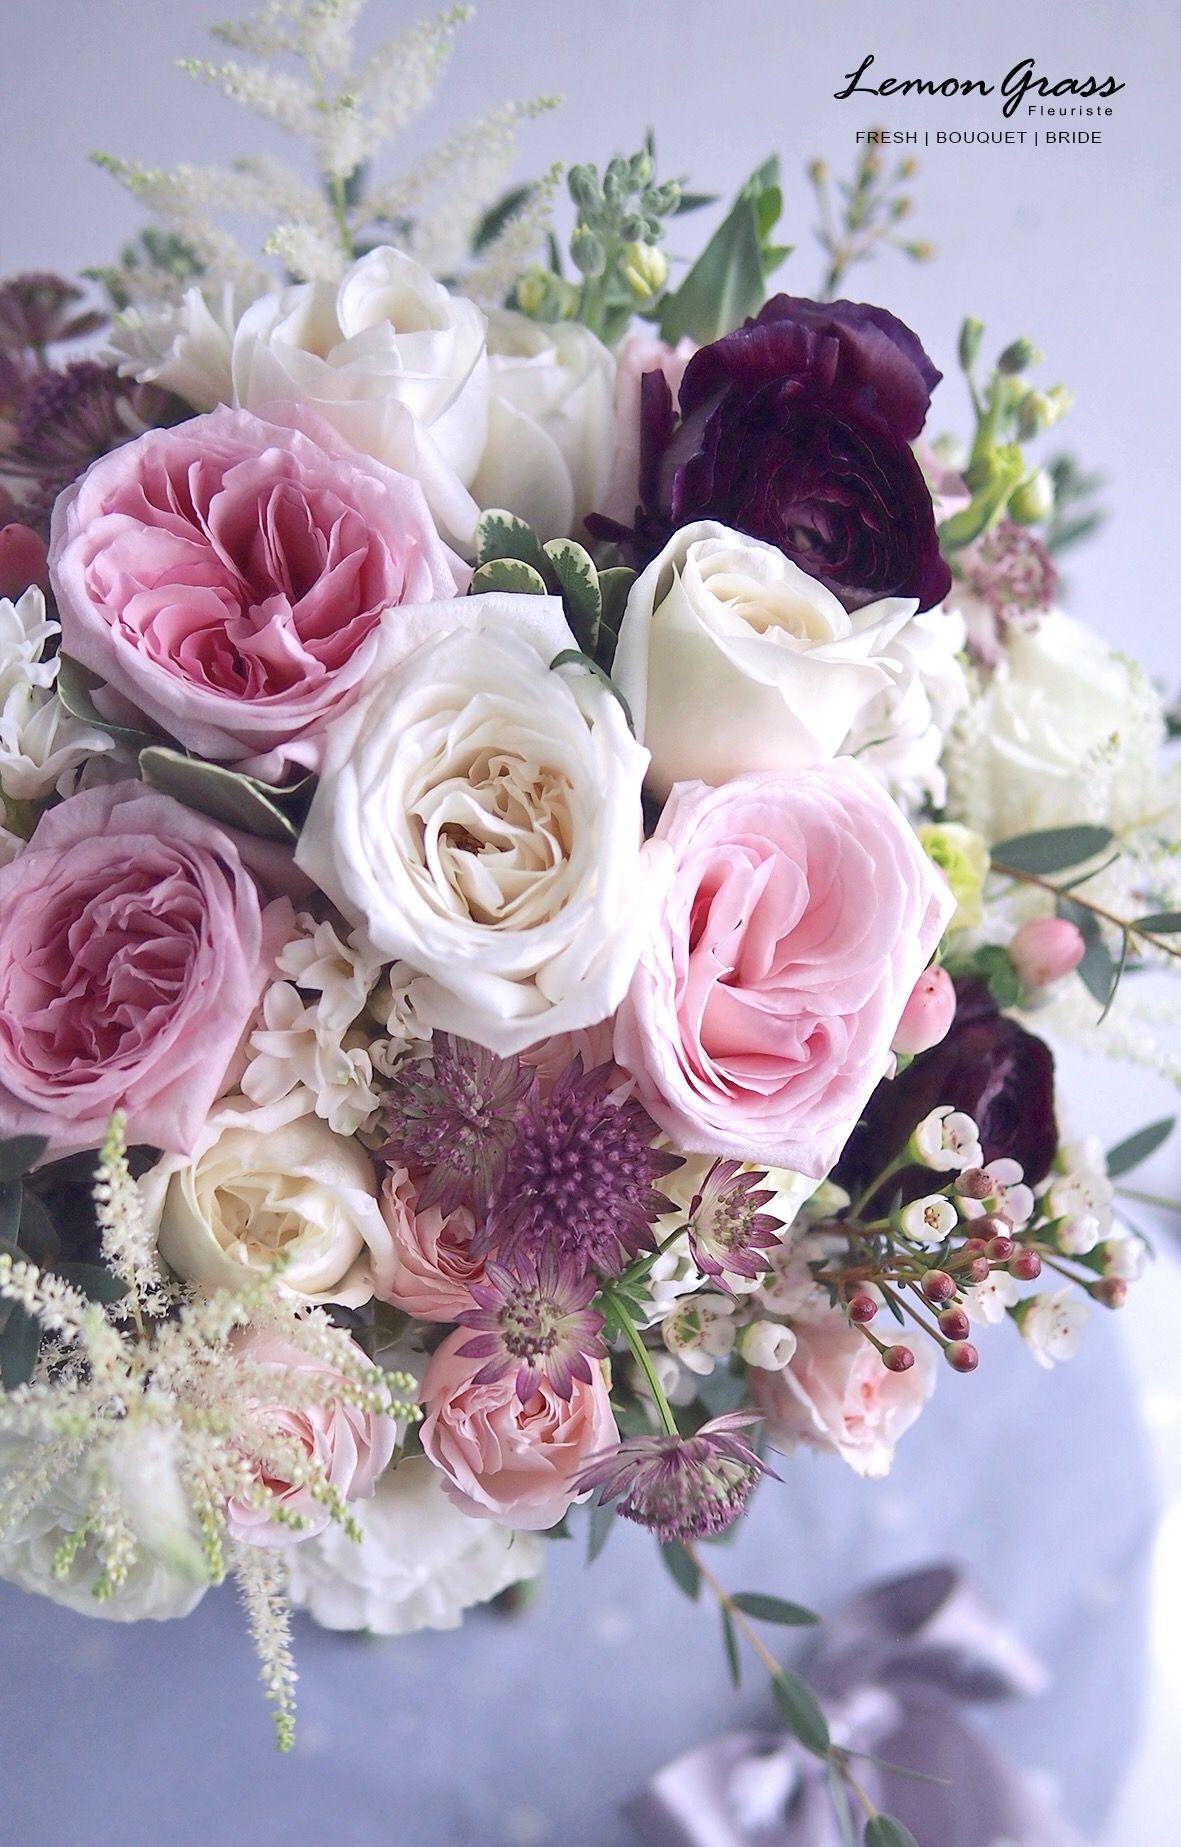 Pin by lemongrasswedding on fresh flower bouquets pinterest flower bouquets bridal bouquets flower designs fresh flowers floral arrangements centerpieces bouquets flower arrangements floral bouquets izmirmasajfo